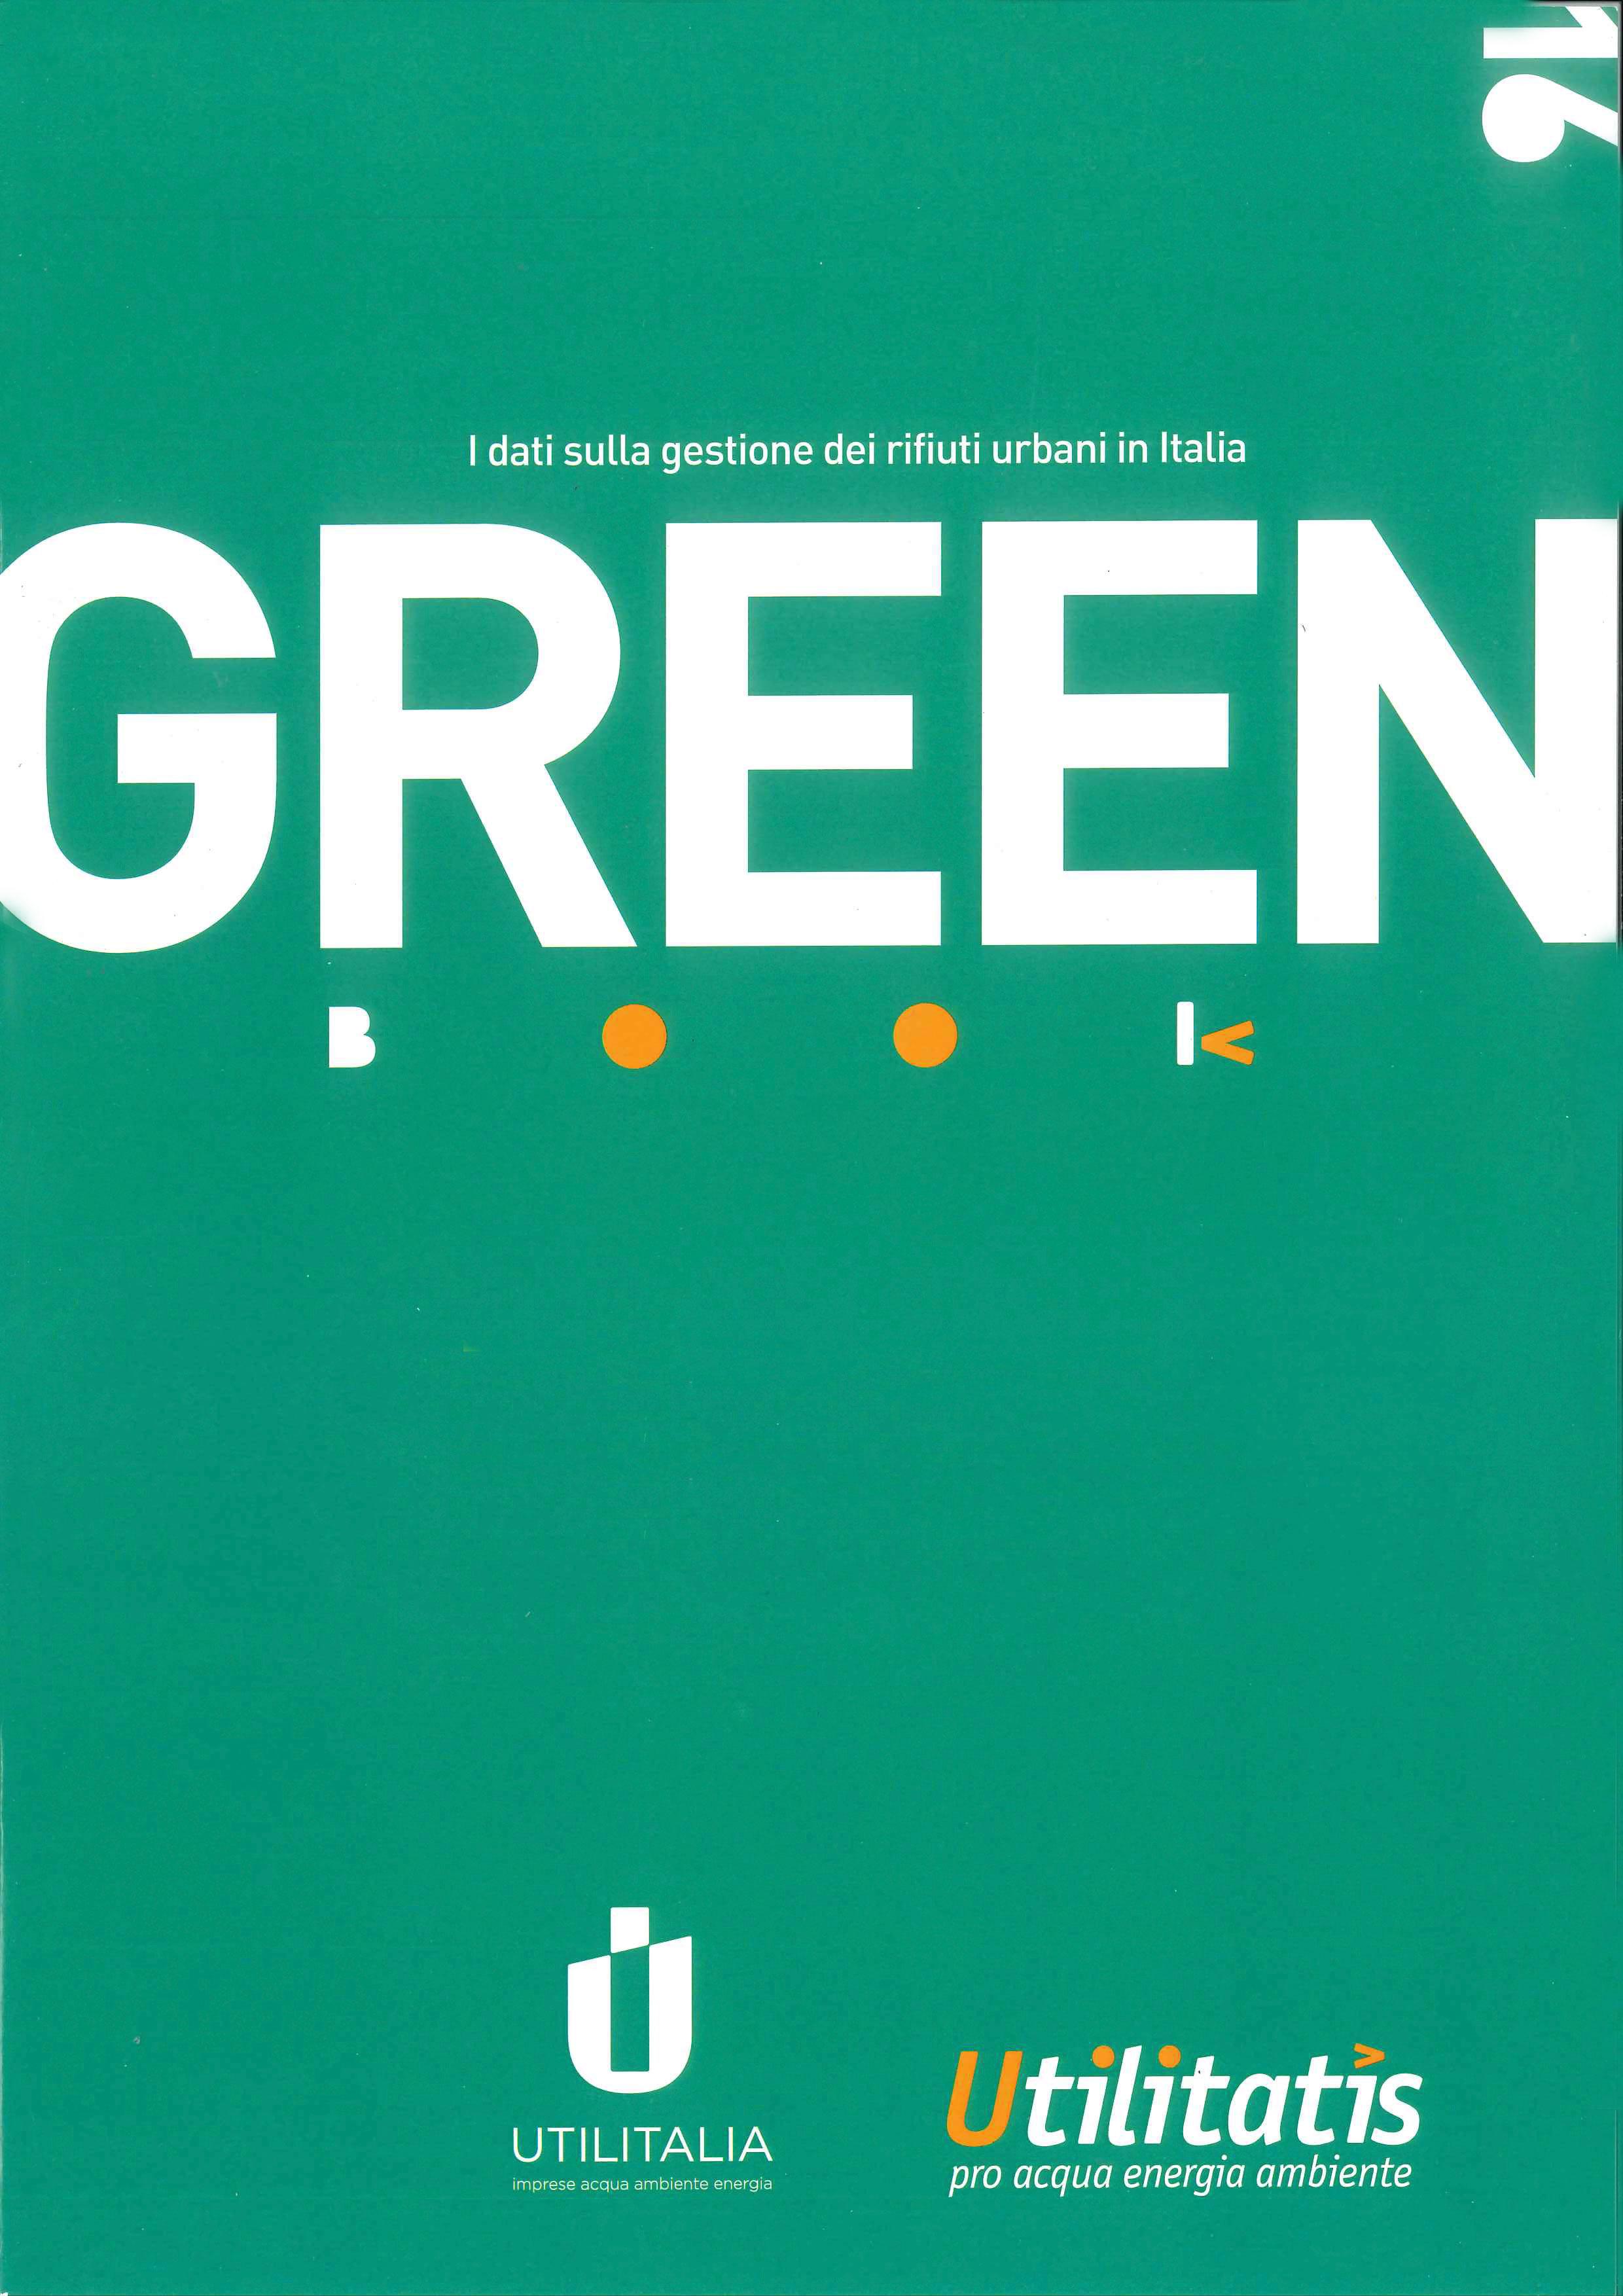 copertinagreenbook.jpg